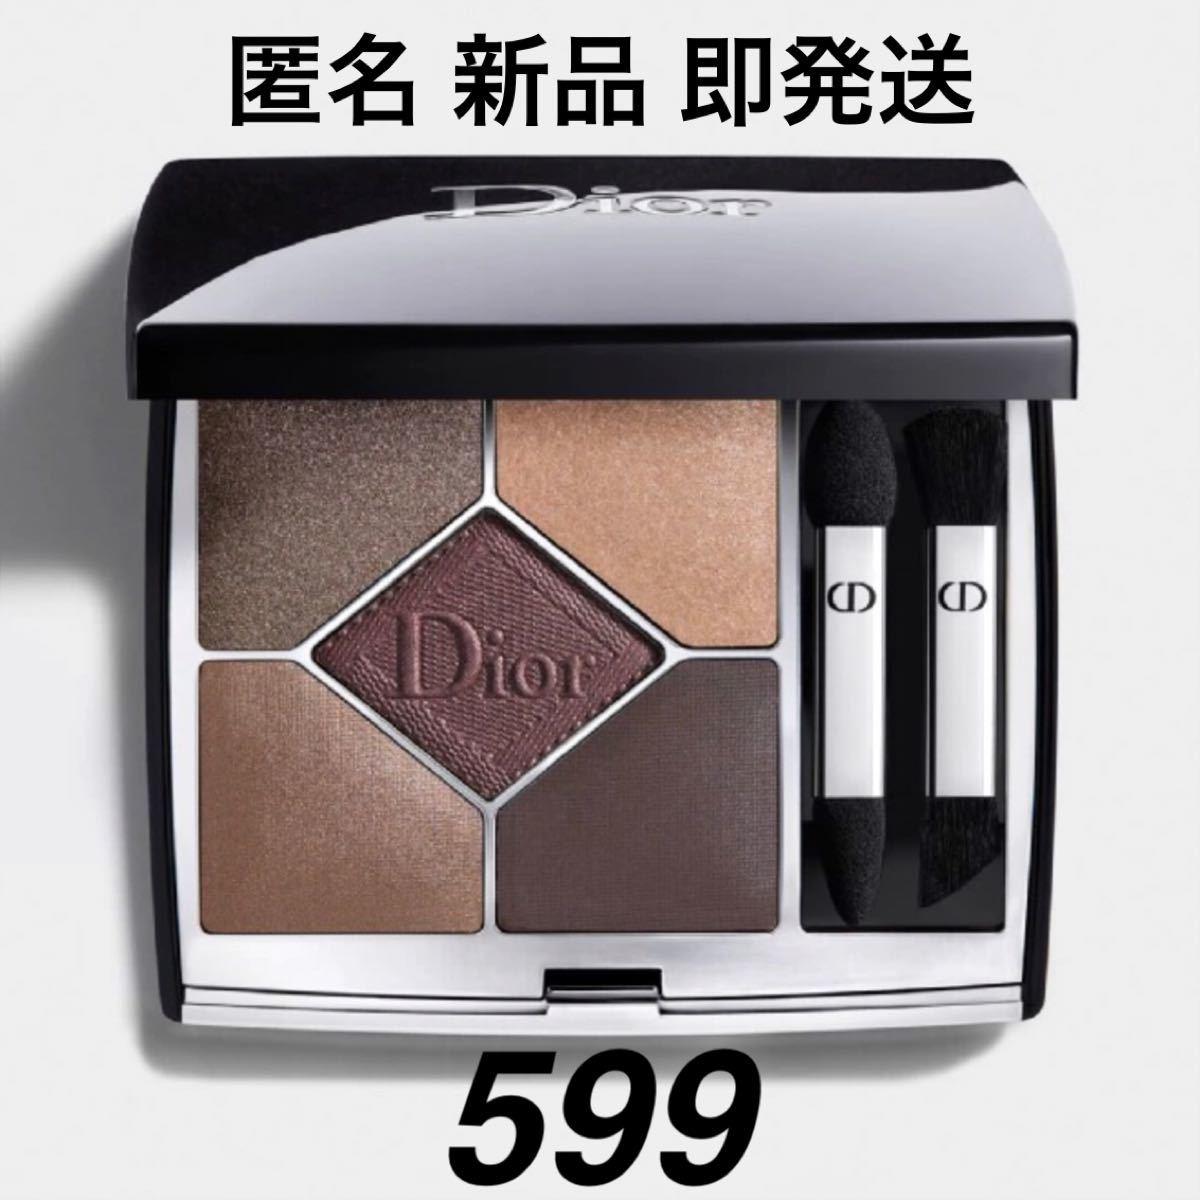 dior 599 new look ニュールック サンククルール アイシャドウ